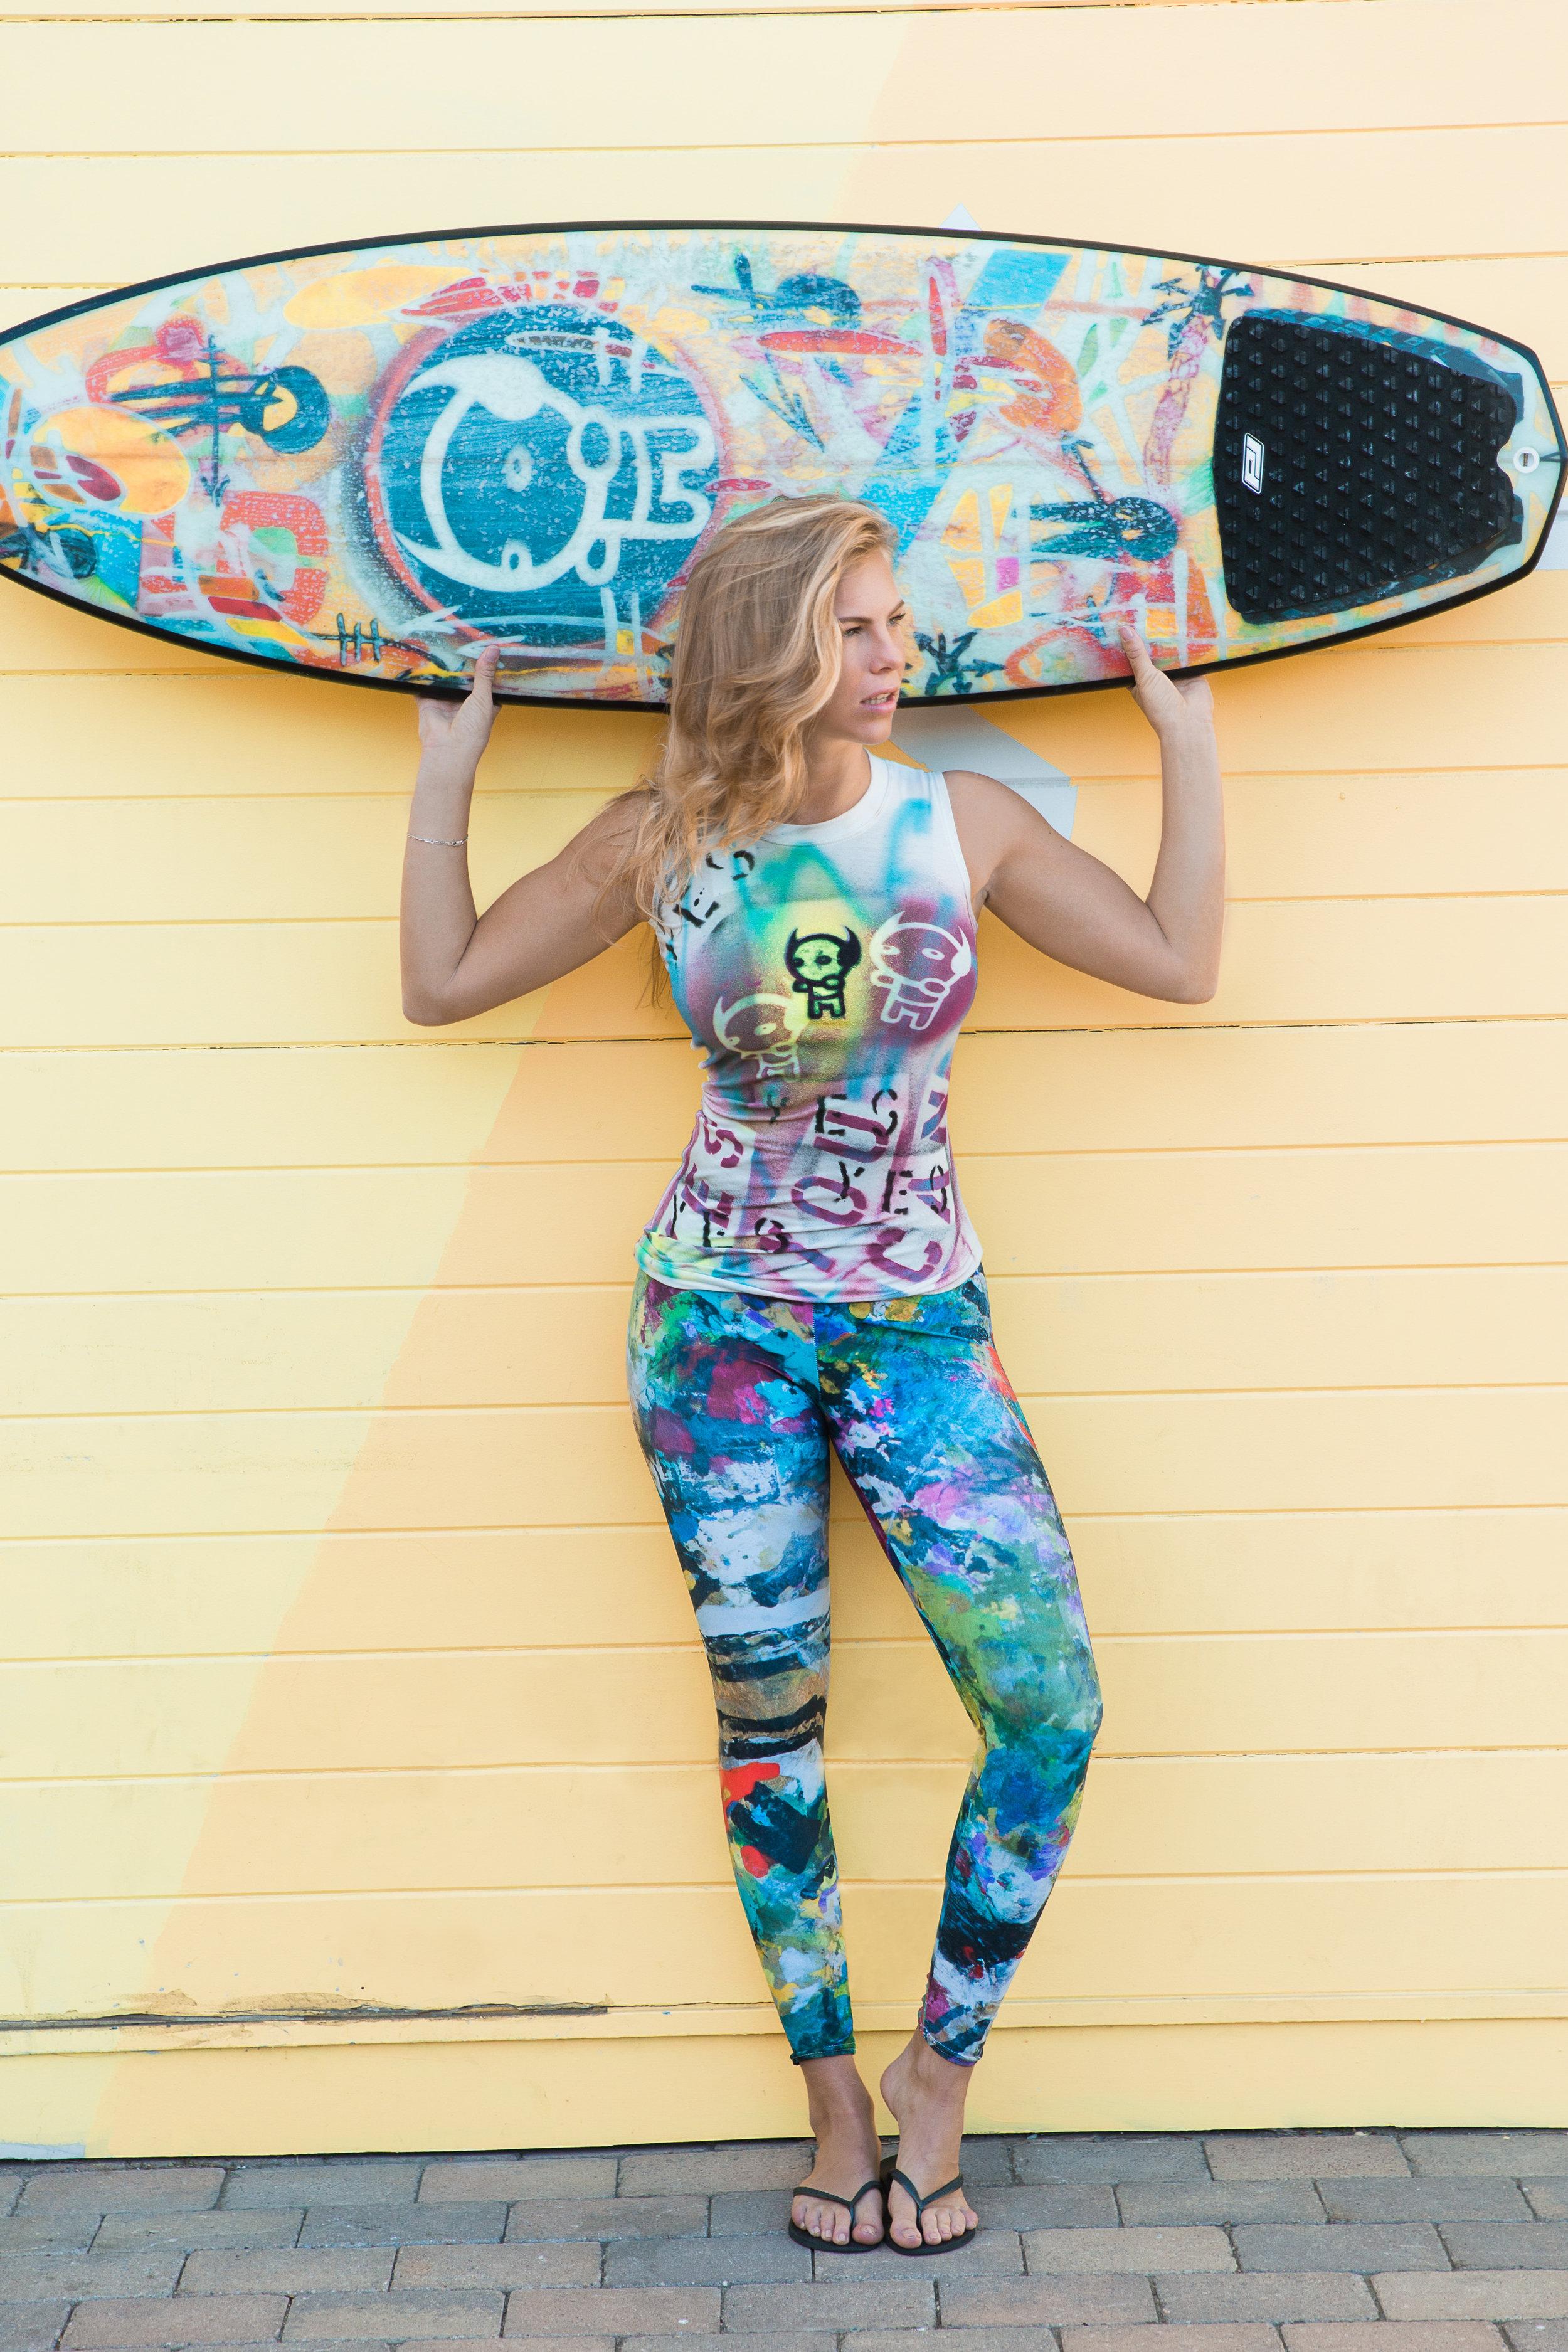 White muscle T-shirt ($269), Sumatra Reef leggings ($125), Torquato surfboard ($7,500)